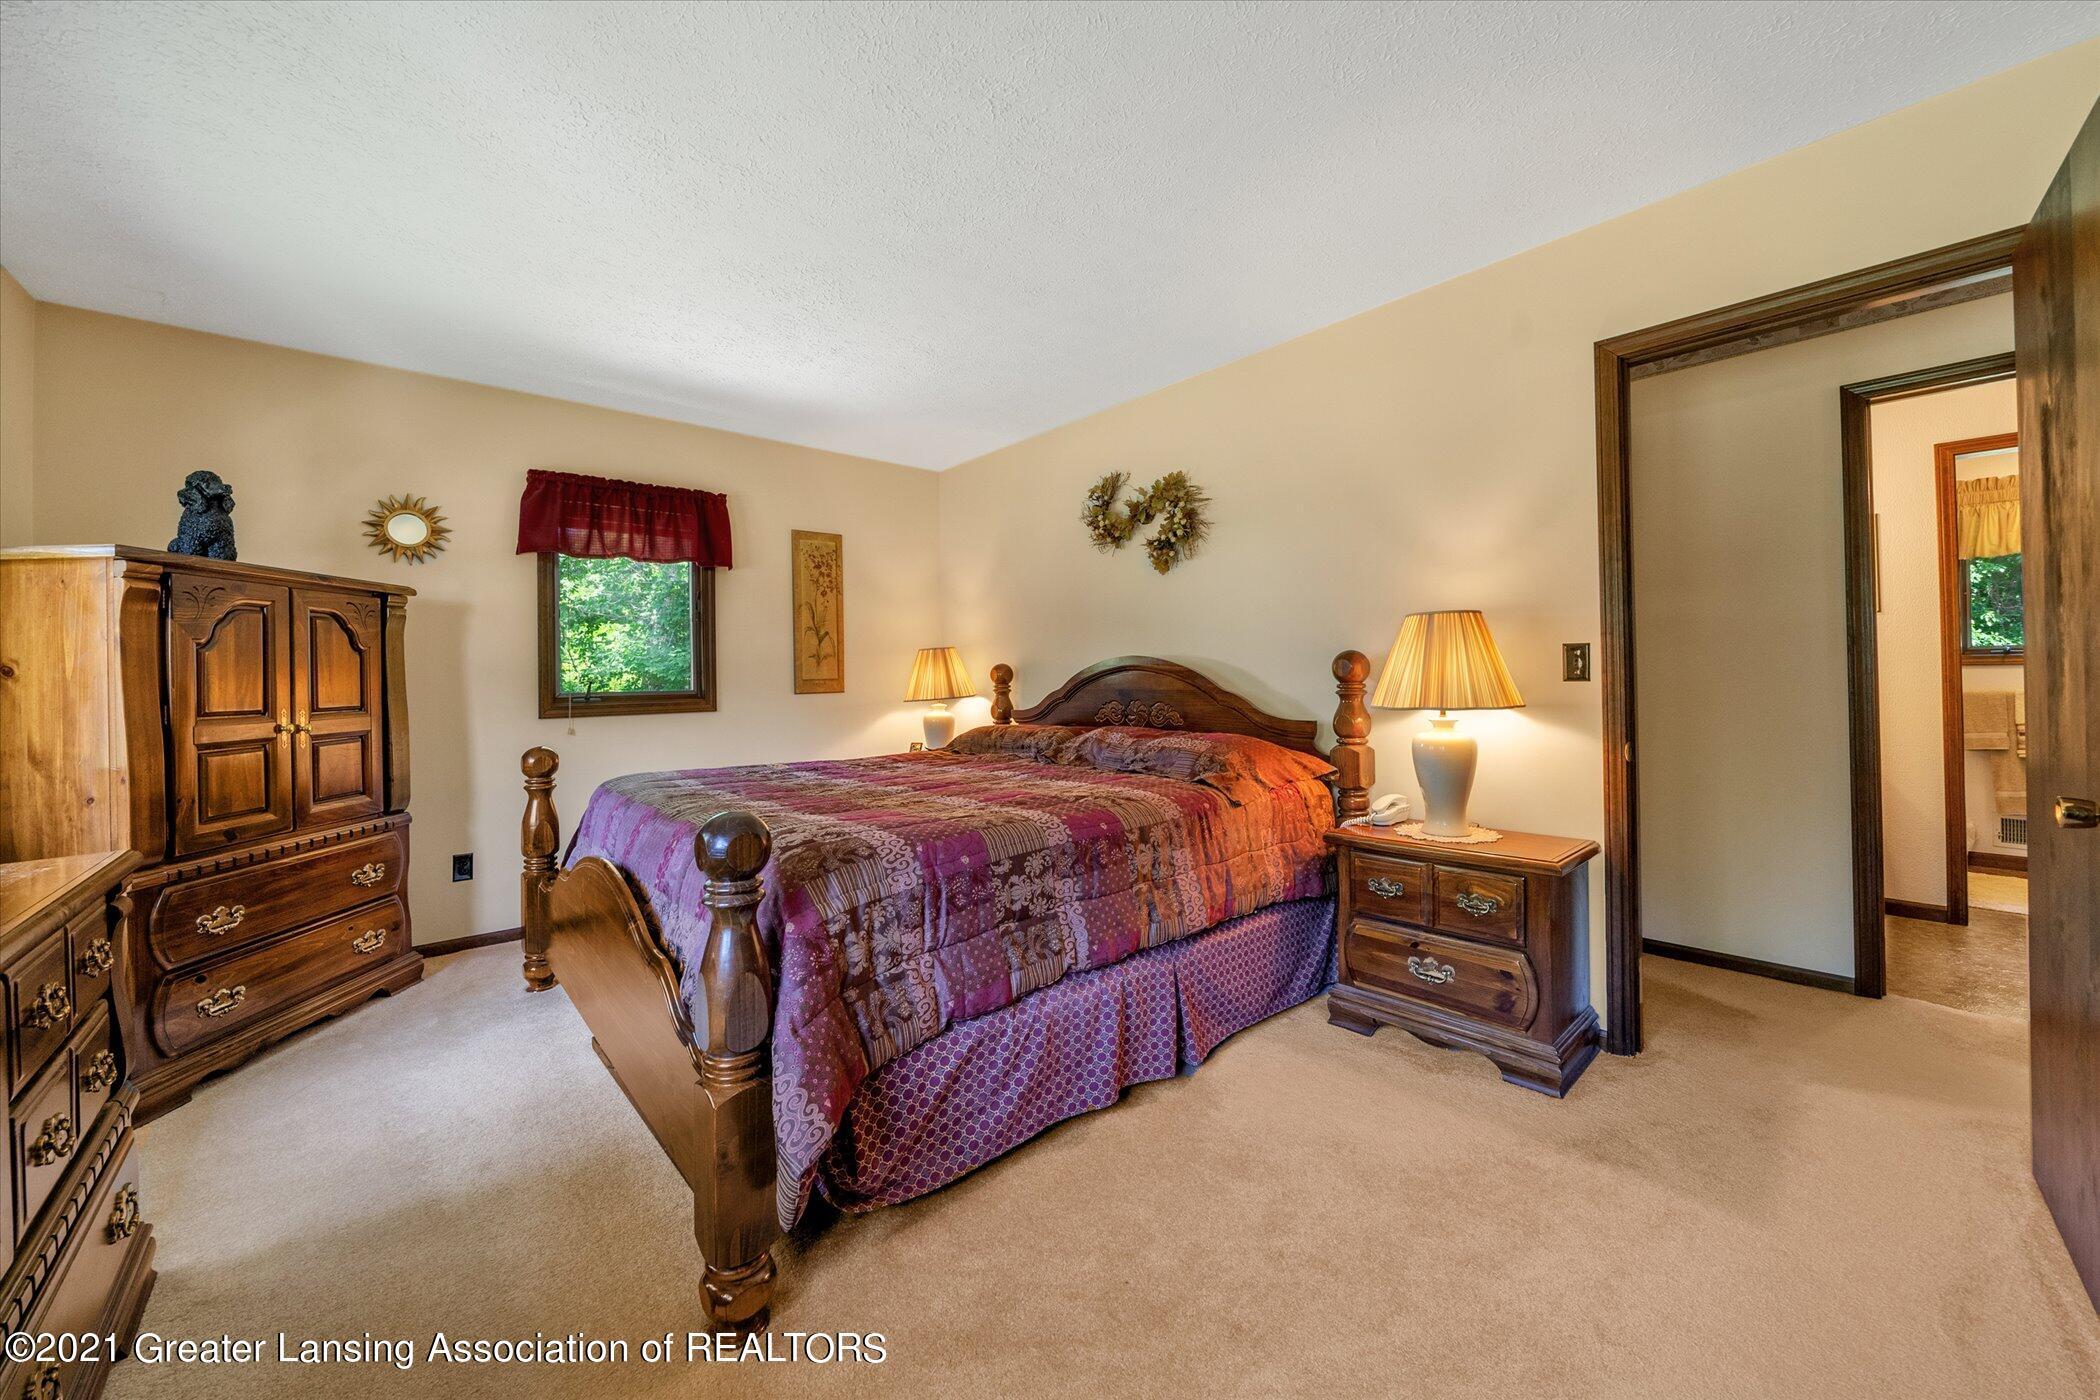 7851 S Cochran Rd - (22) MAIN FLOOR Bedroom 1 - 22